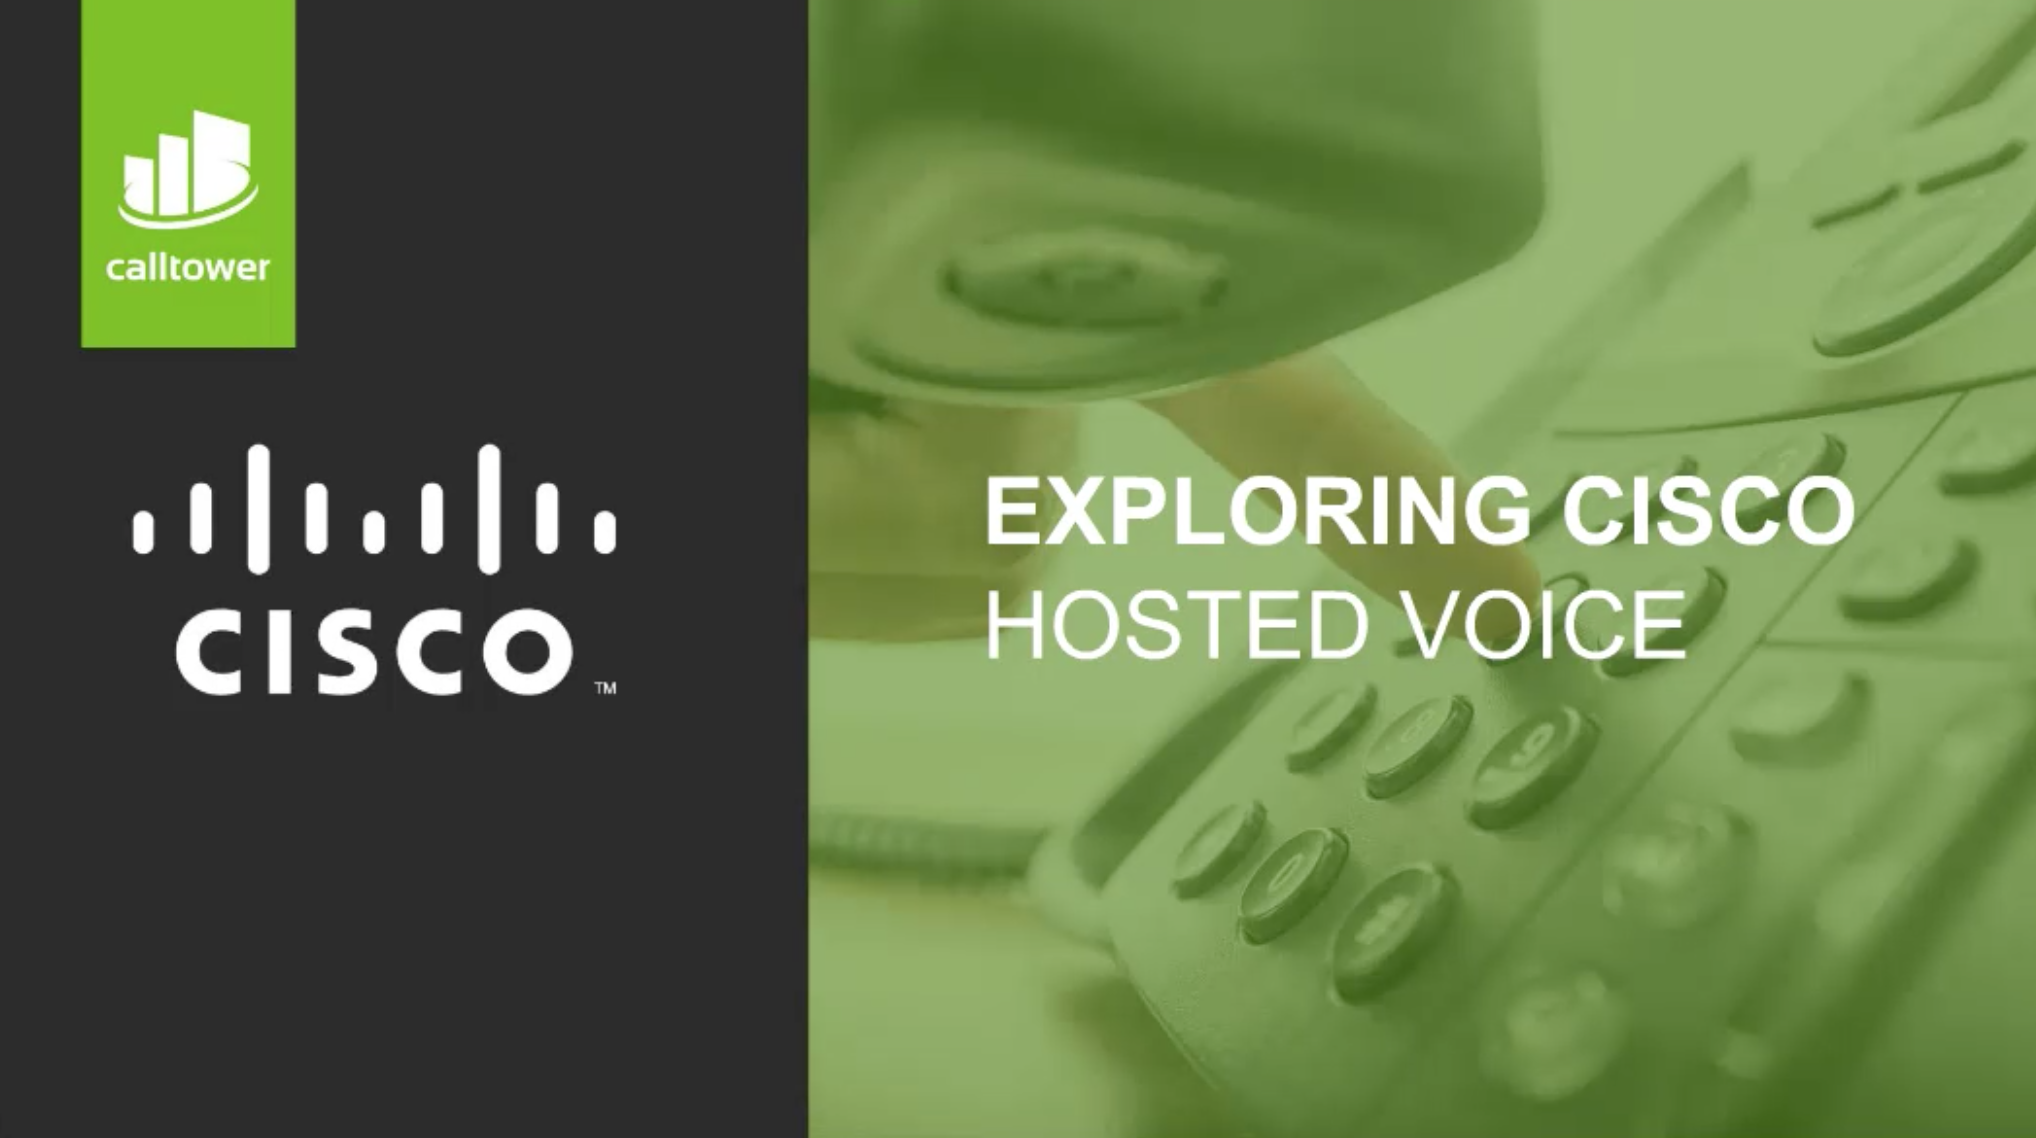 Webinar_Exploring_Cisco_Hosted_Voice.png